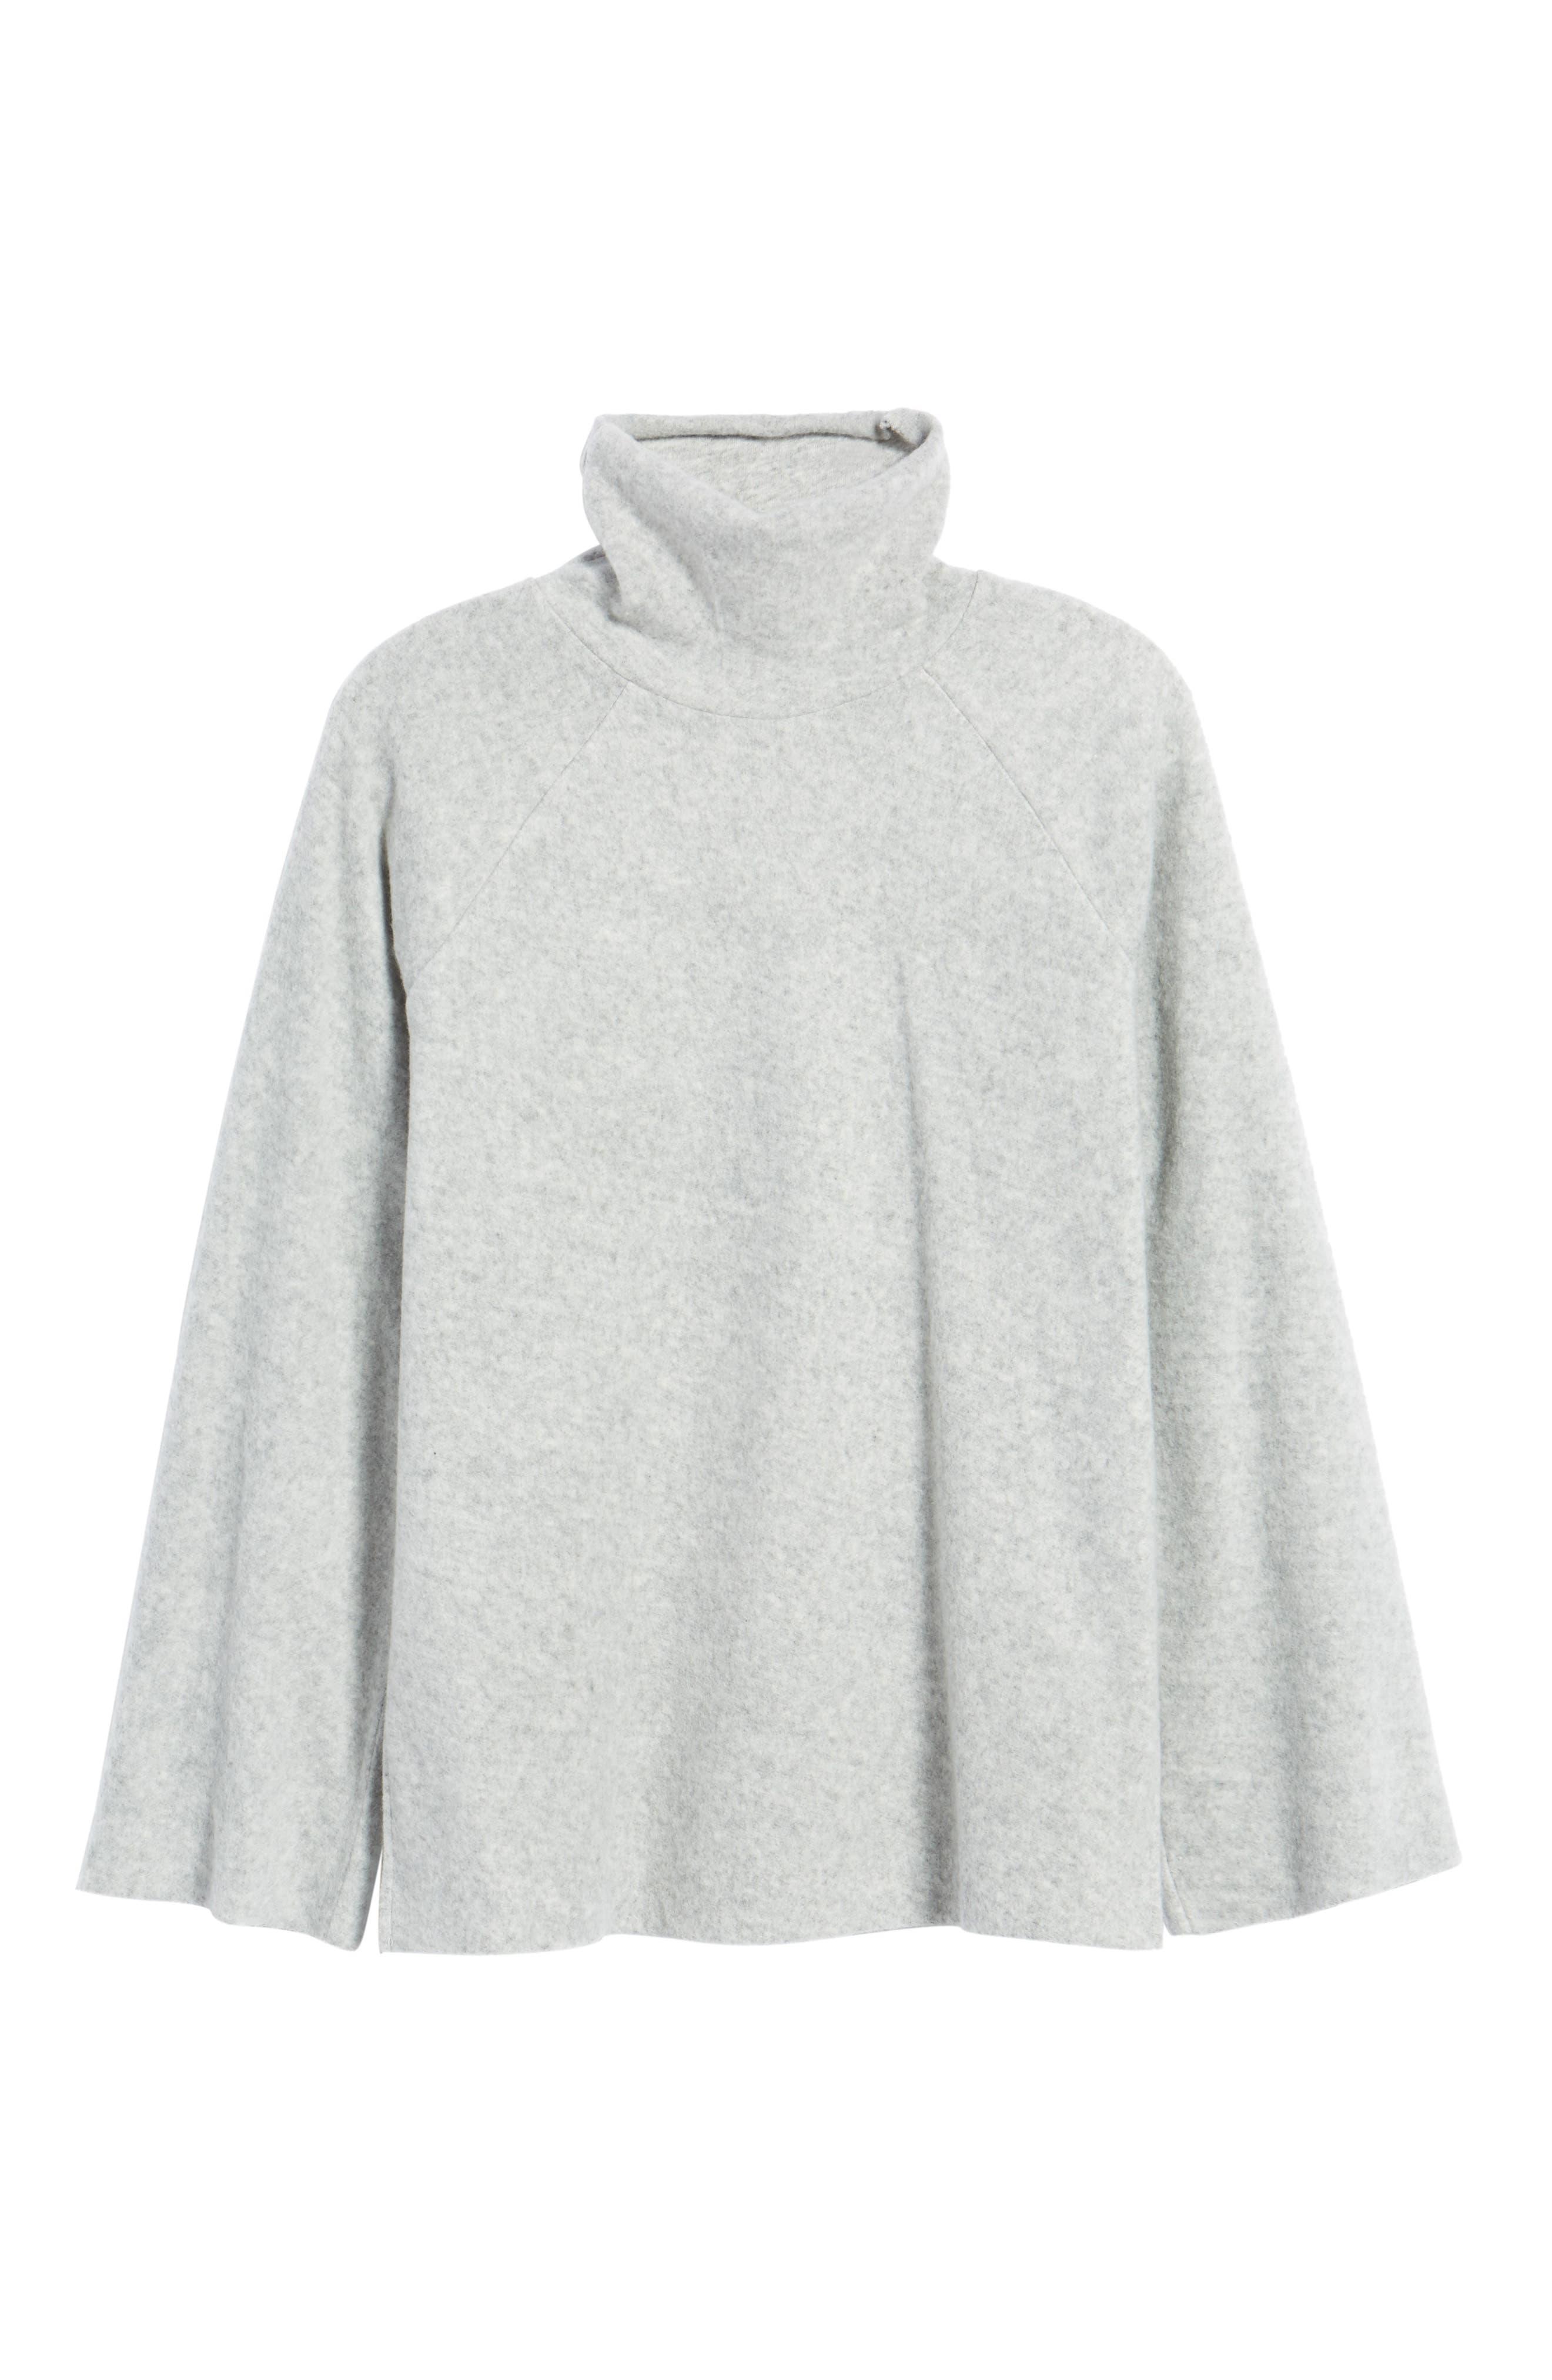 Bell Sleeve Sweatshirt,                             Alternate thumbnail 6, color,                             Grey Heather